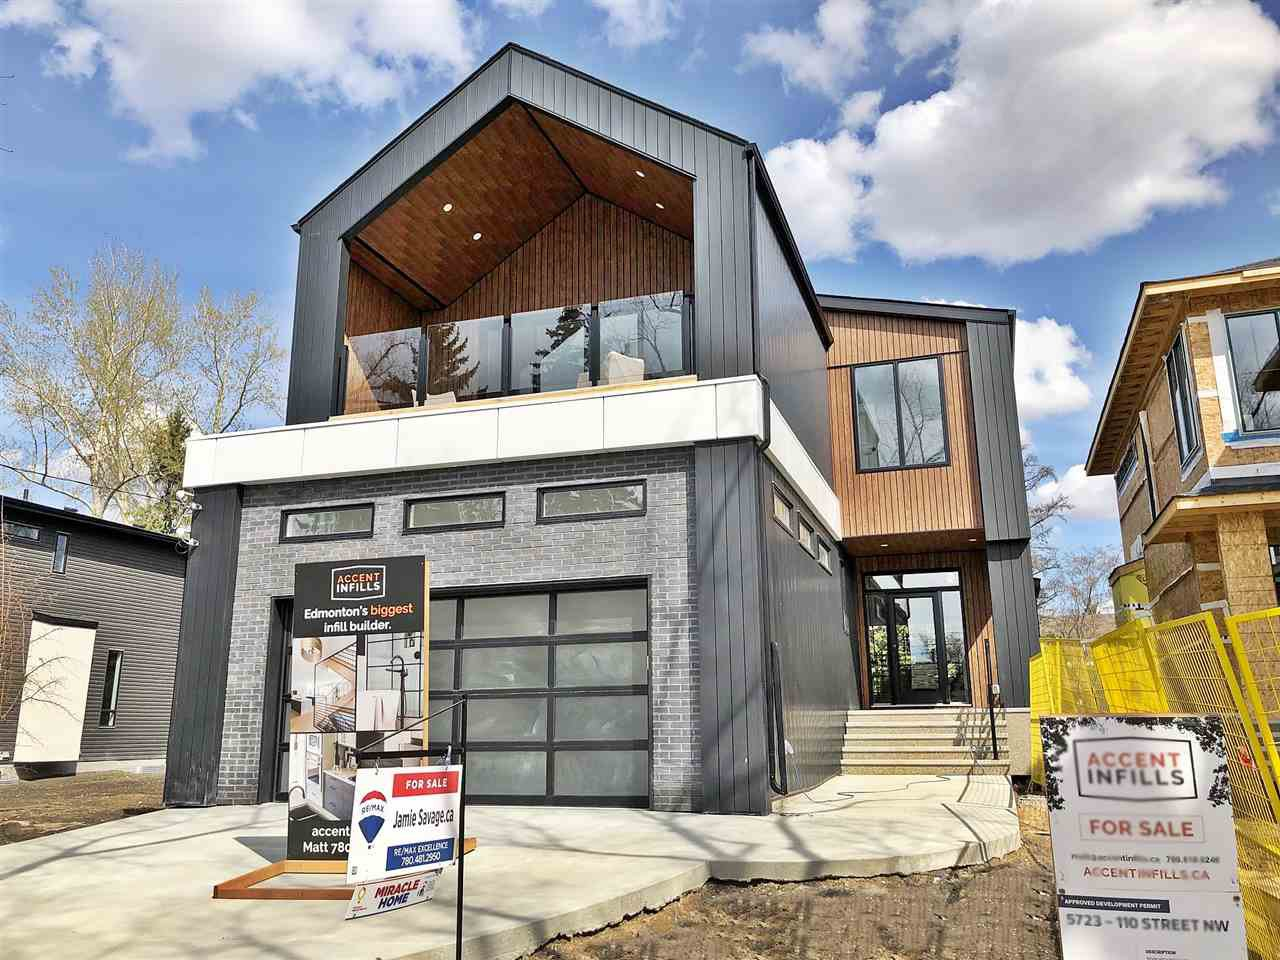 Main Photo: 5723 110 Street in Edmonton: Zone 15 House for sale : MLS®# E4188445